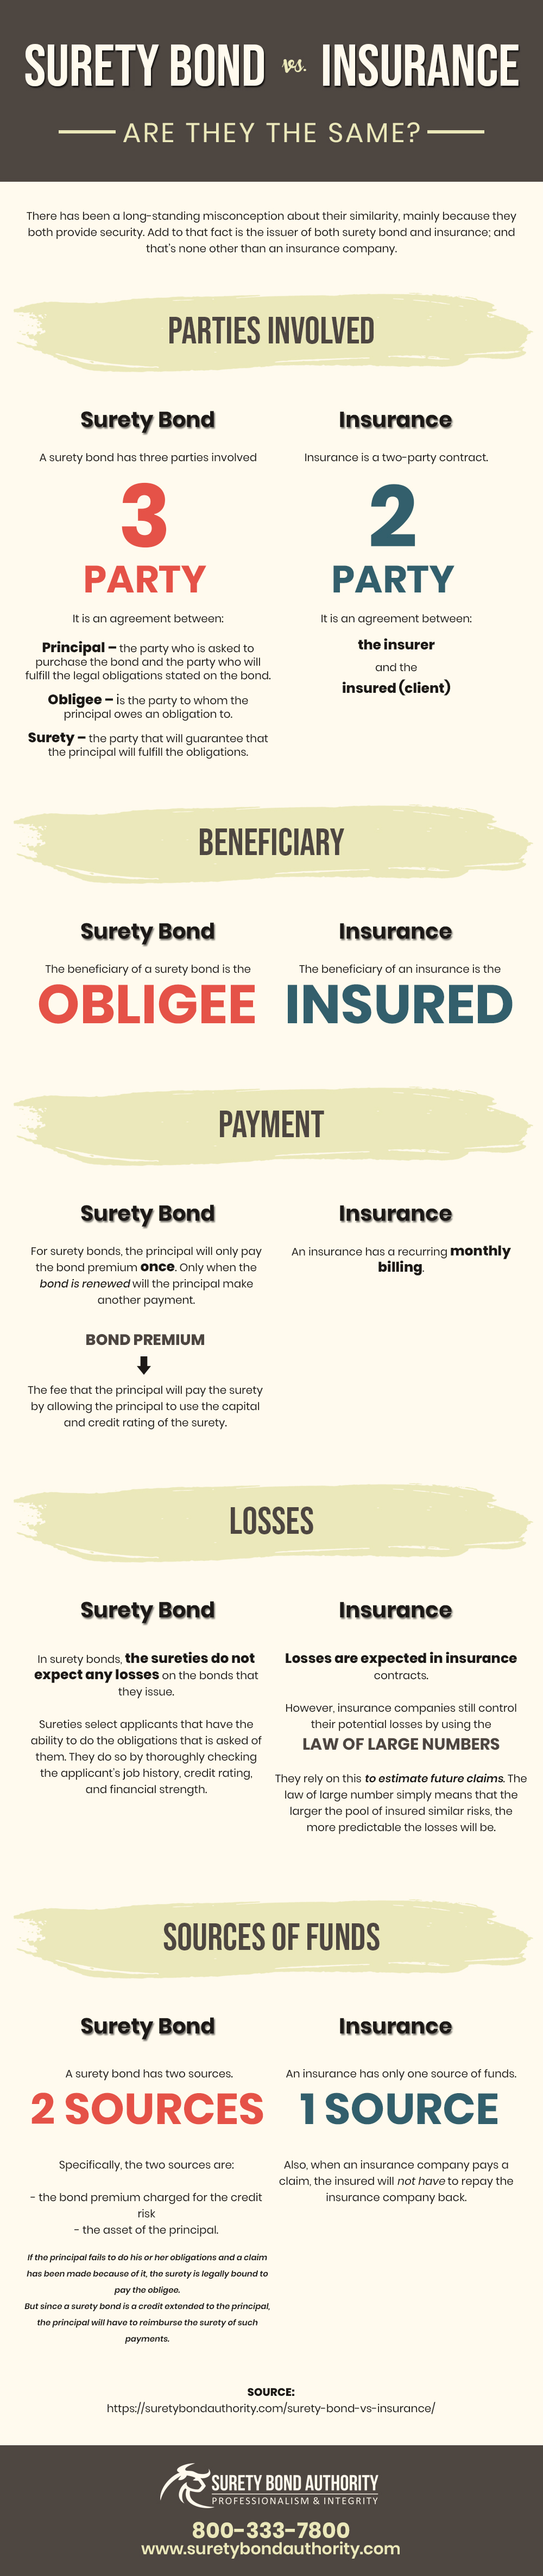 Surety vs Insurance Infographic